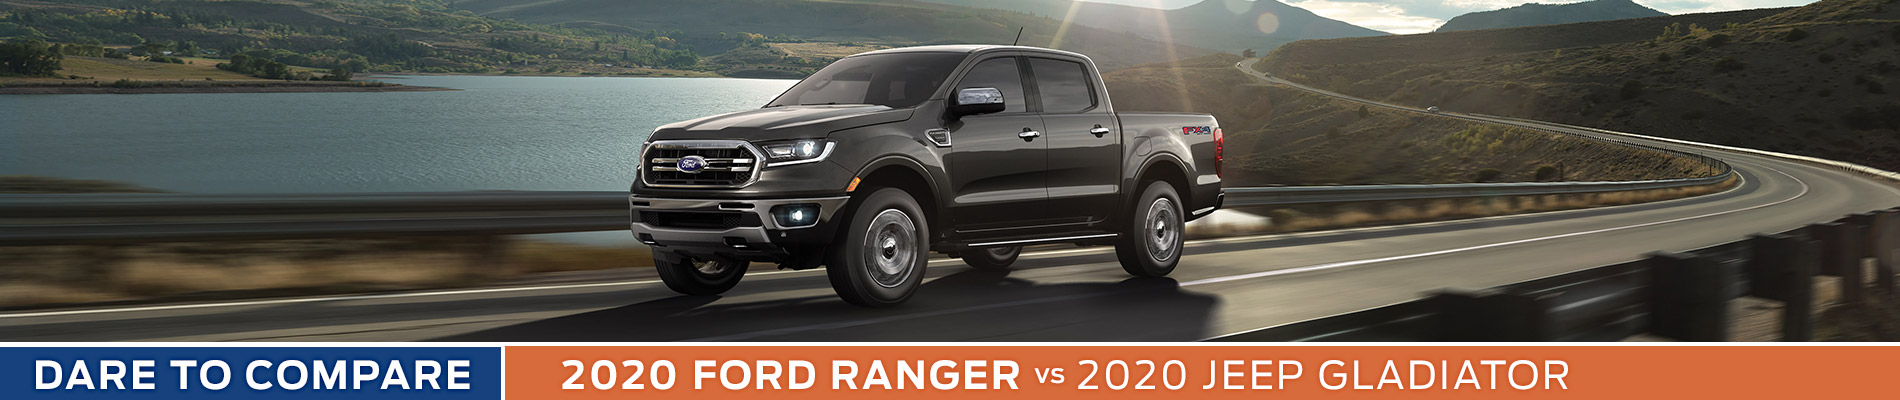 2020 Ford Ranger vs Jeep Gladiator - Sun State Ford - Orlando, FL